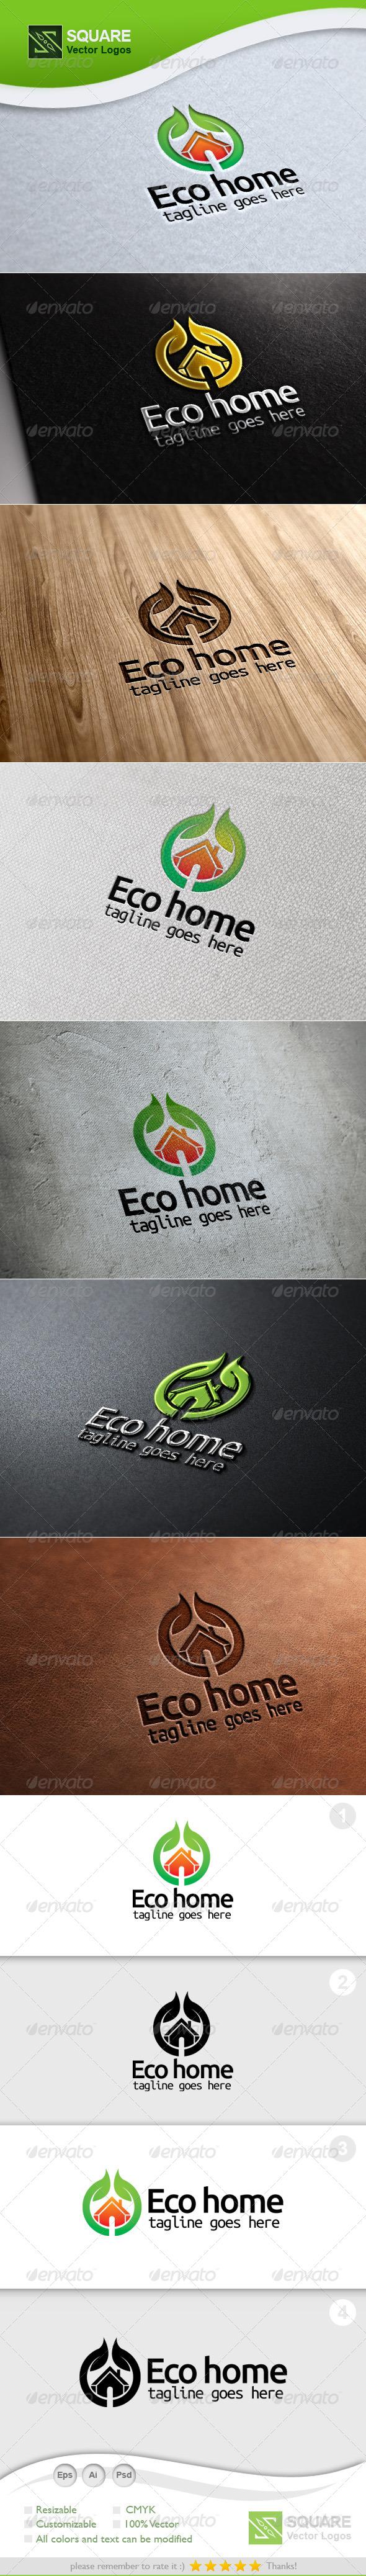 GraphicRiver Eco Home Vector Logo Template 5400162